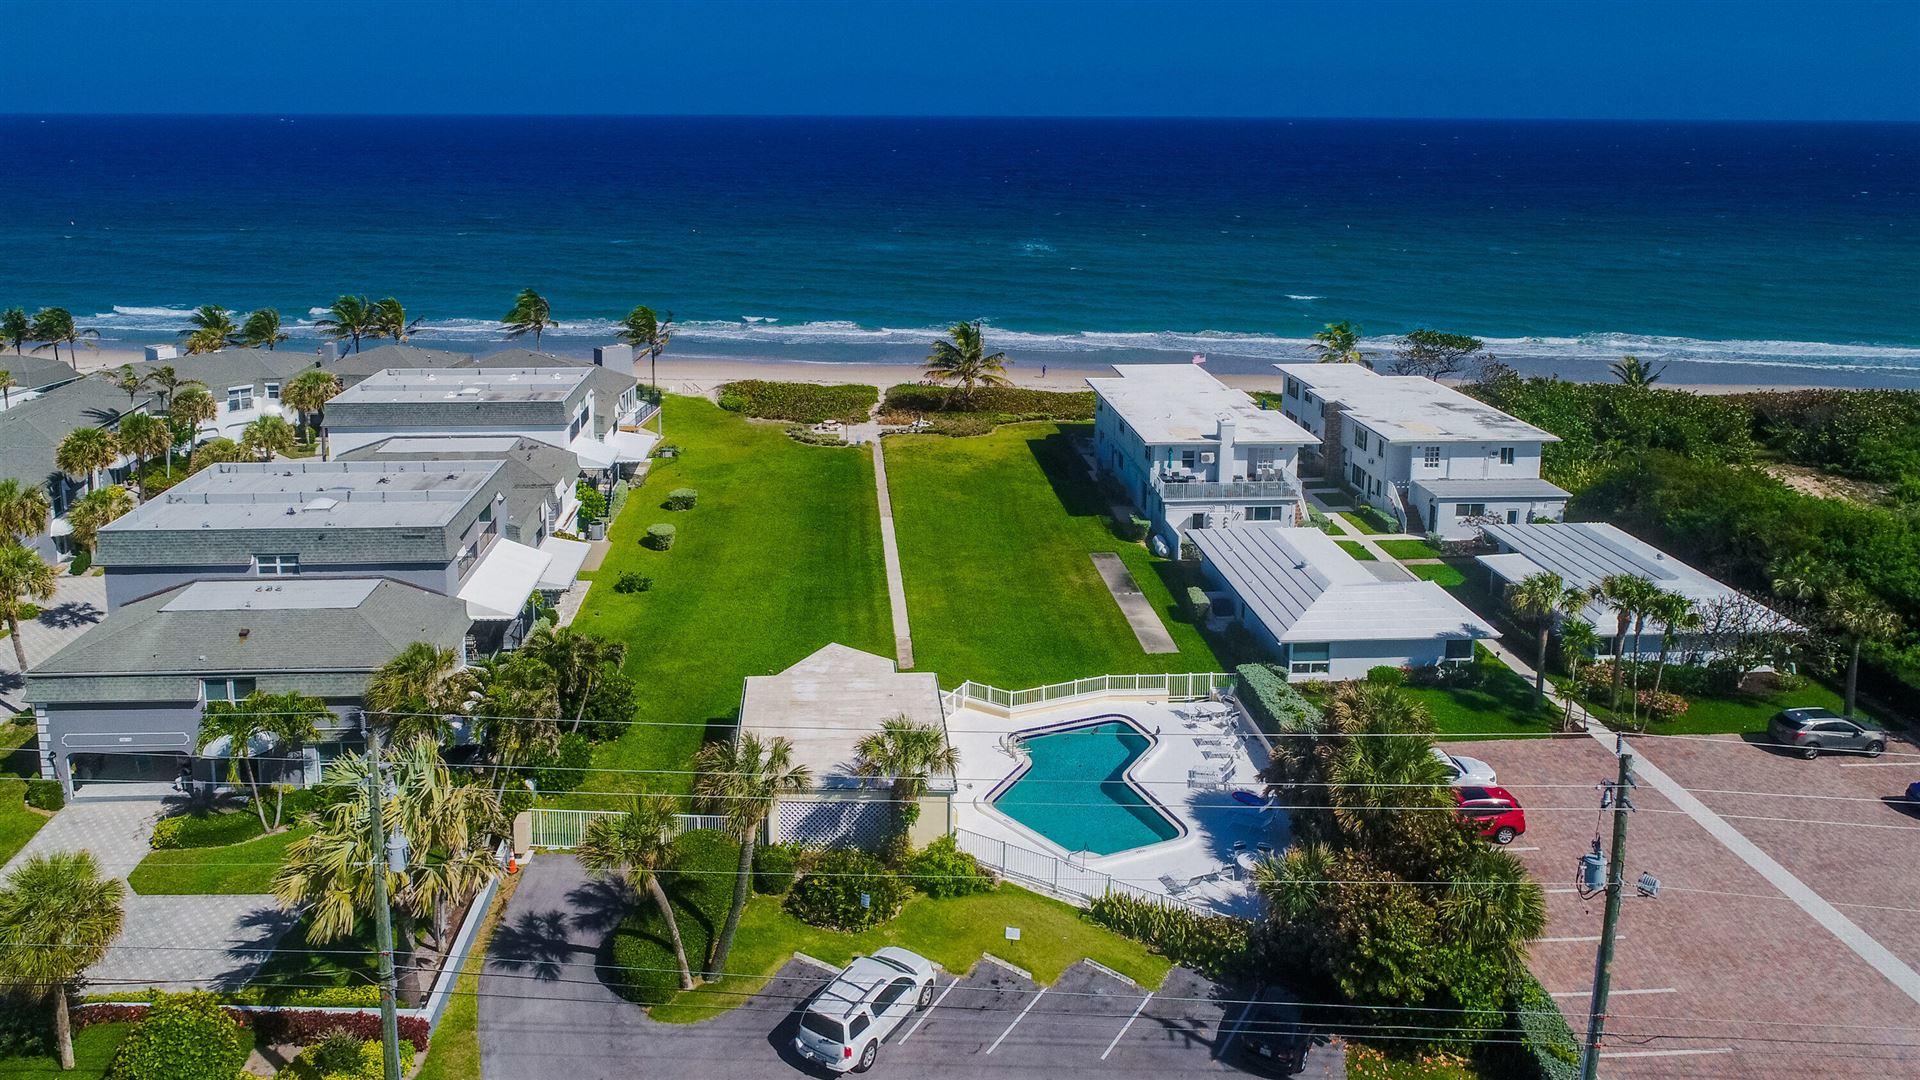 1189 Hillsboro Mile #4, Hillsboro Beach, FL 33062 - MLS#: RX-10625146